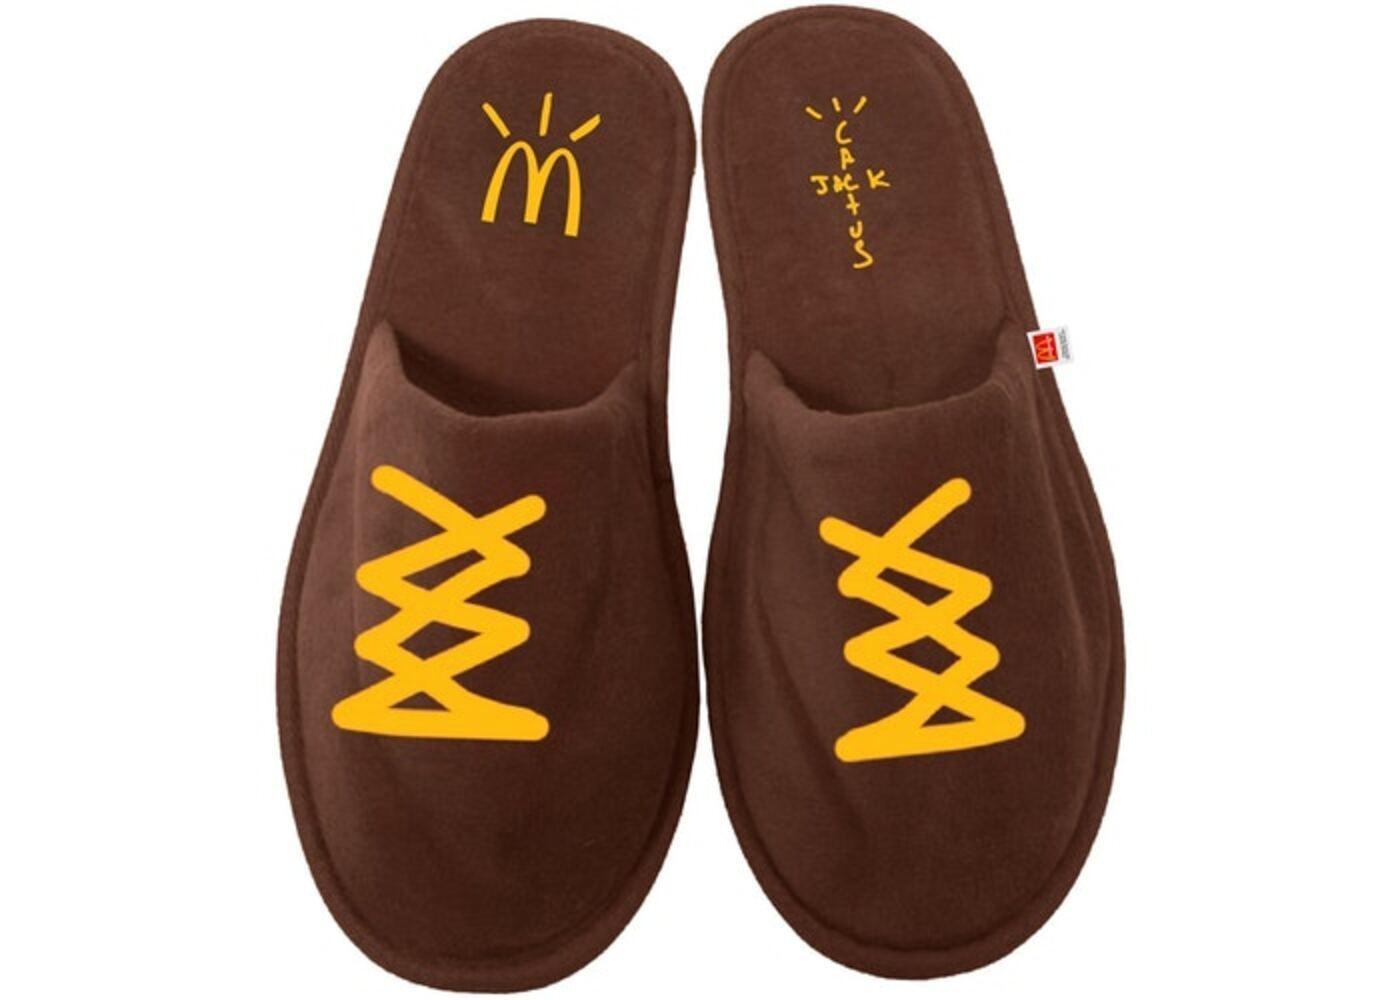 Travis Scott x McDonald's Cj House Slippers Brownの写真